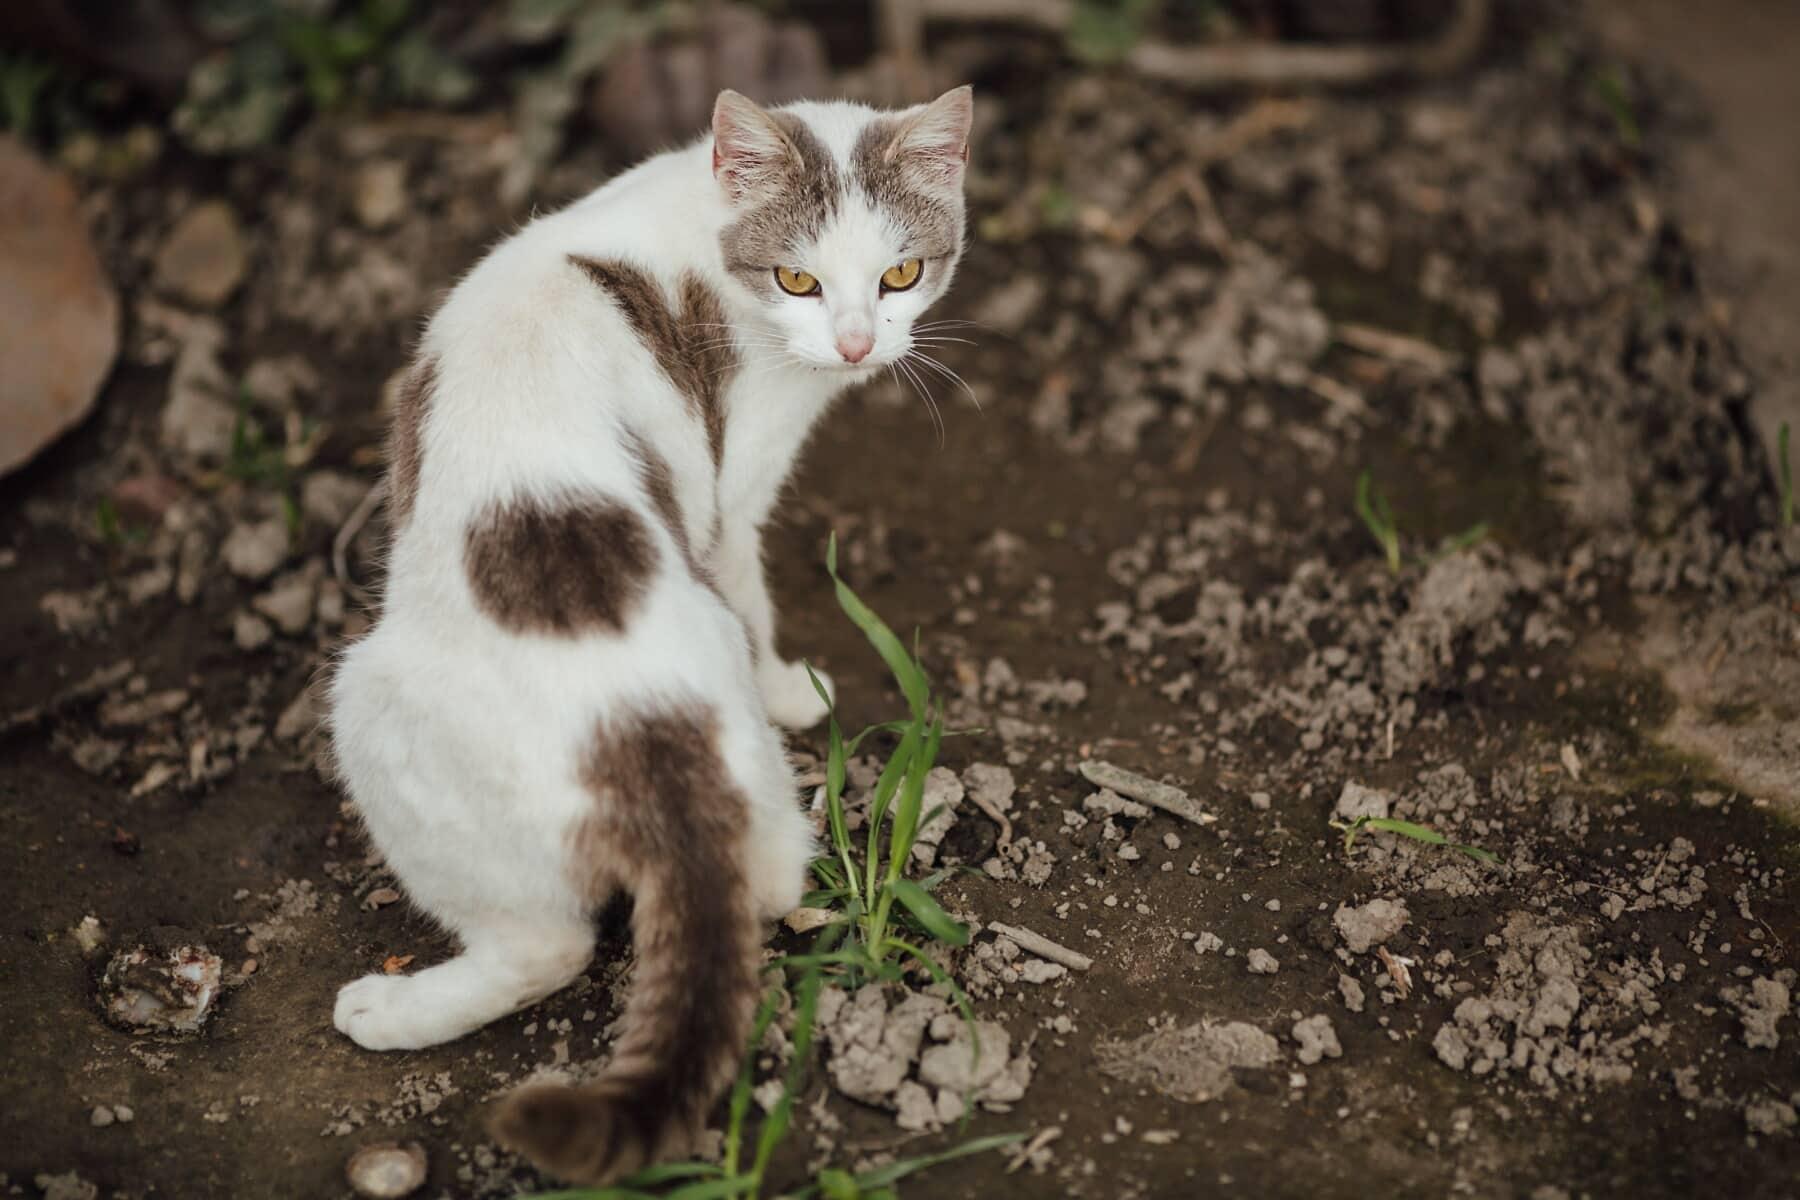 feline, kitten, cat, animal, kitty, young, cute, pet, fur, whiskers